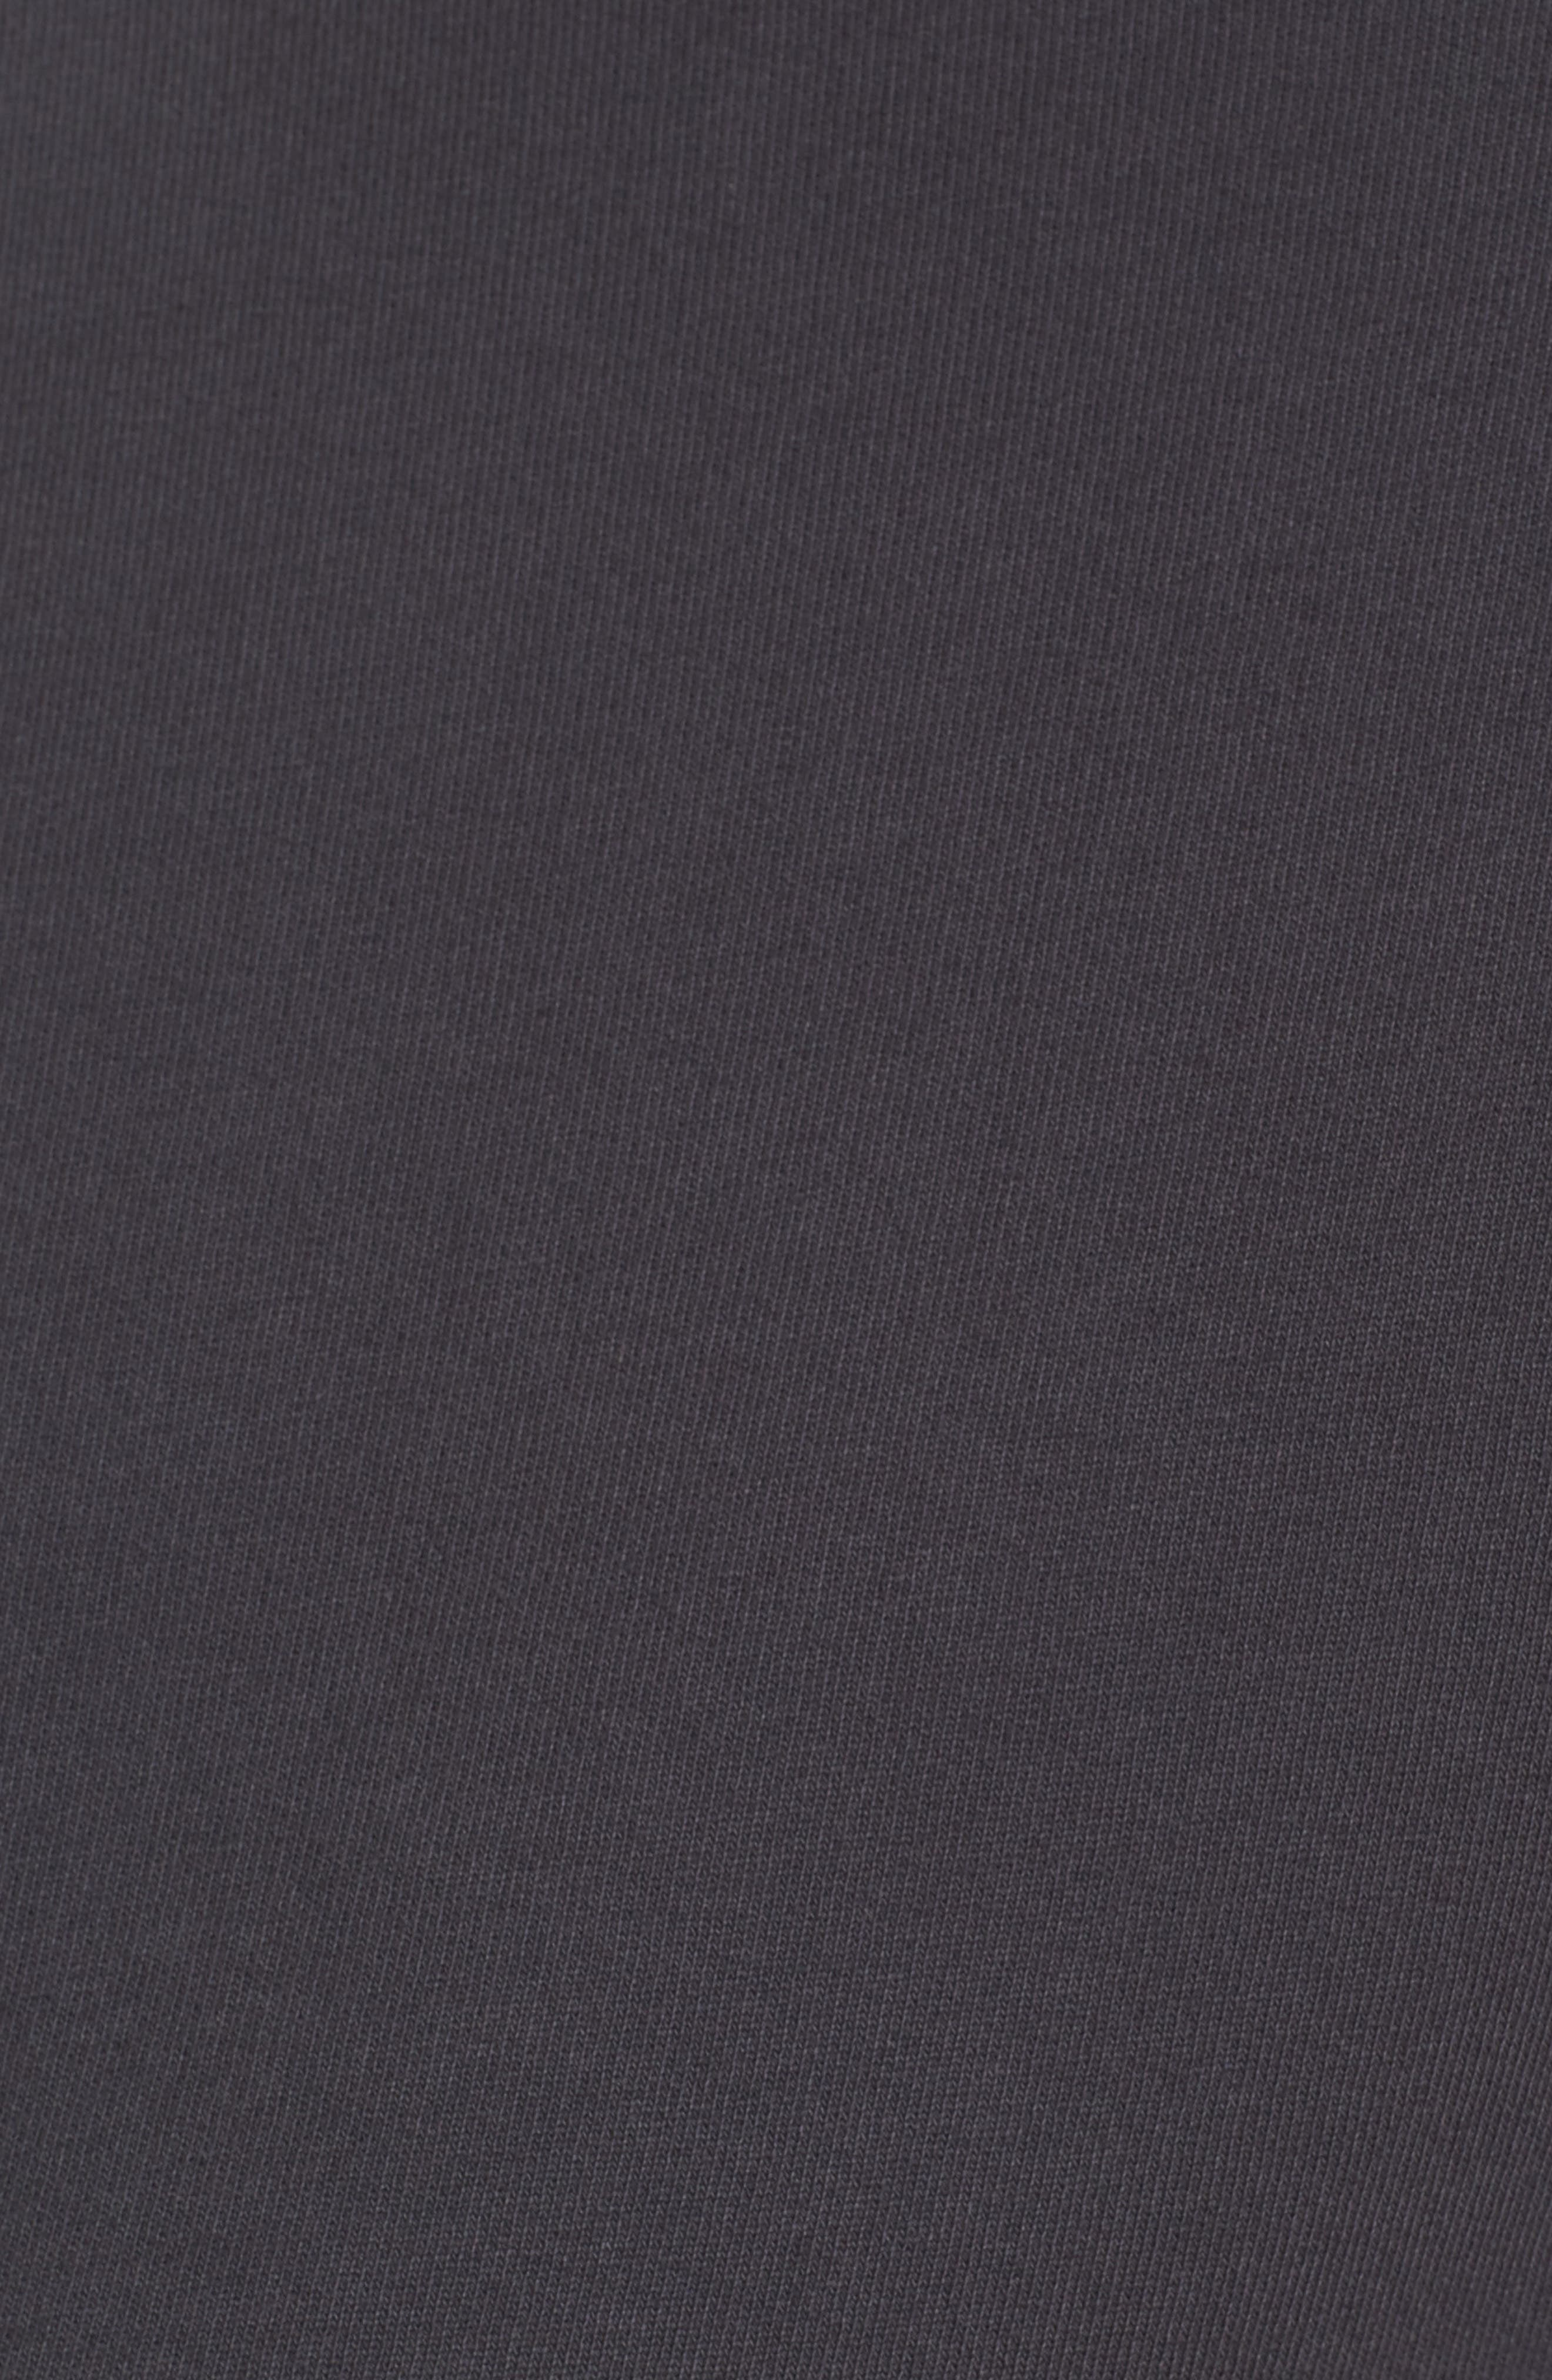 Alternate Image 5  - Frank & Eileen Tee Lab Cotton Poncho